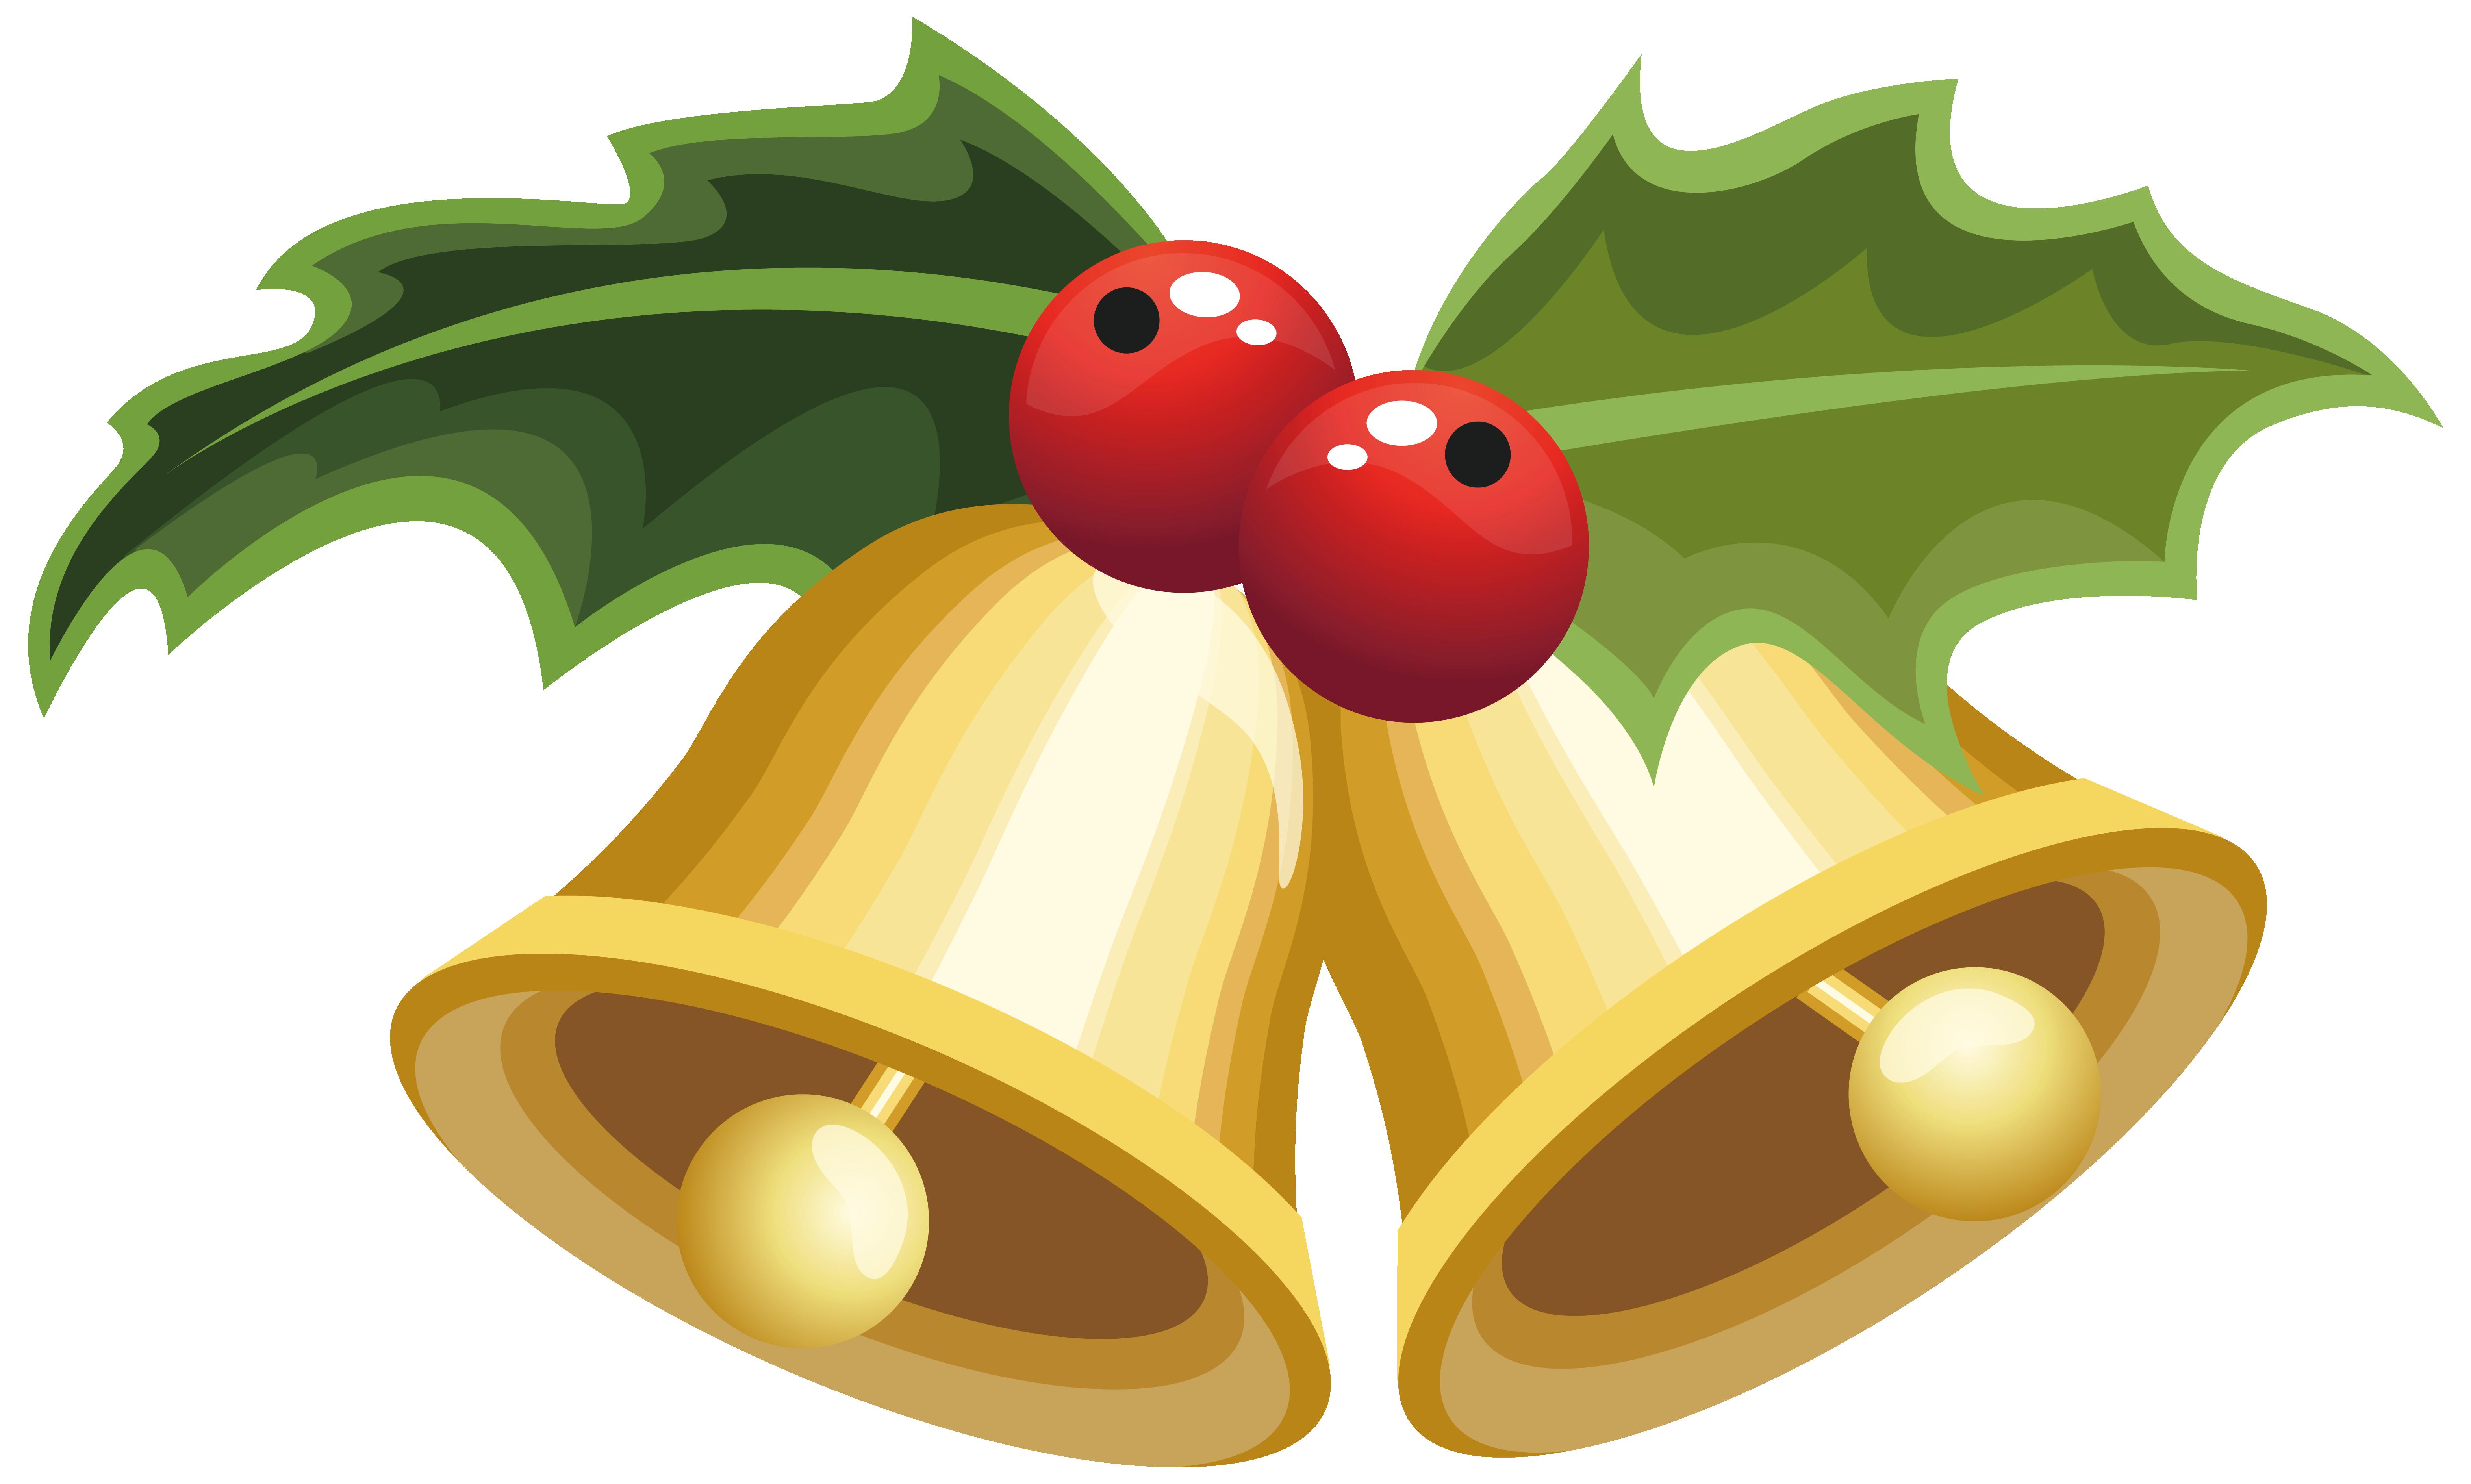 Clipart Of Mistletoe.